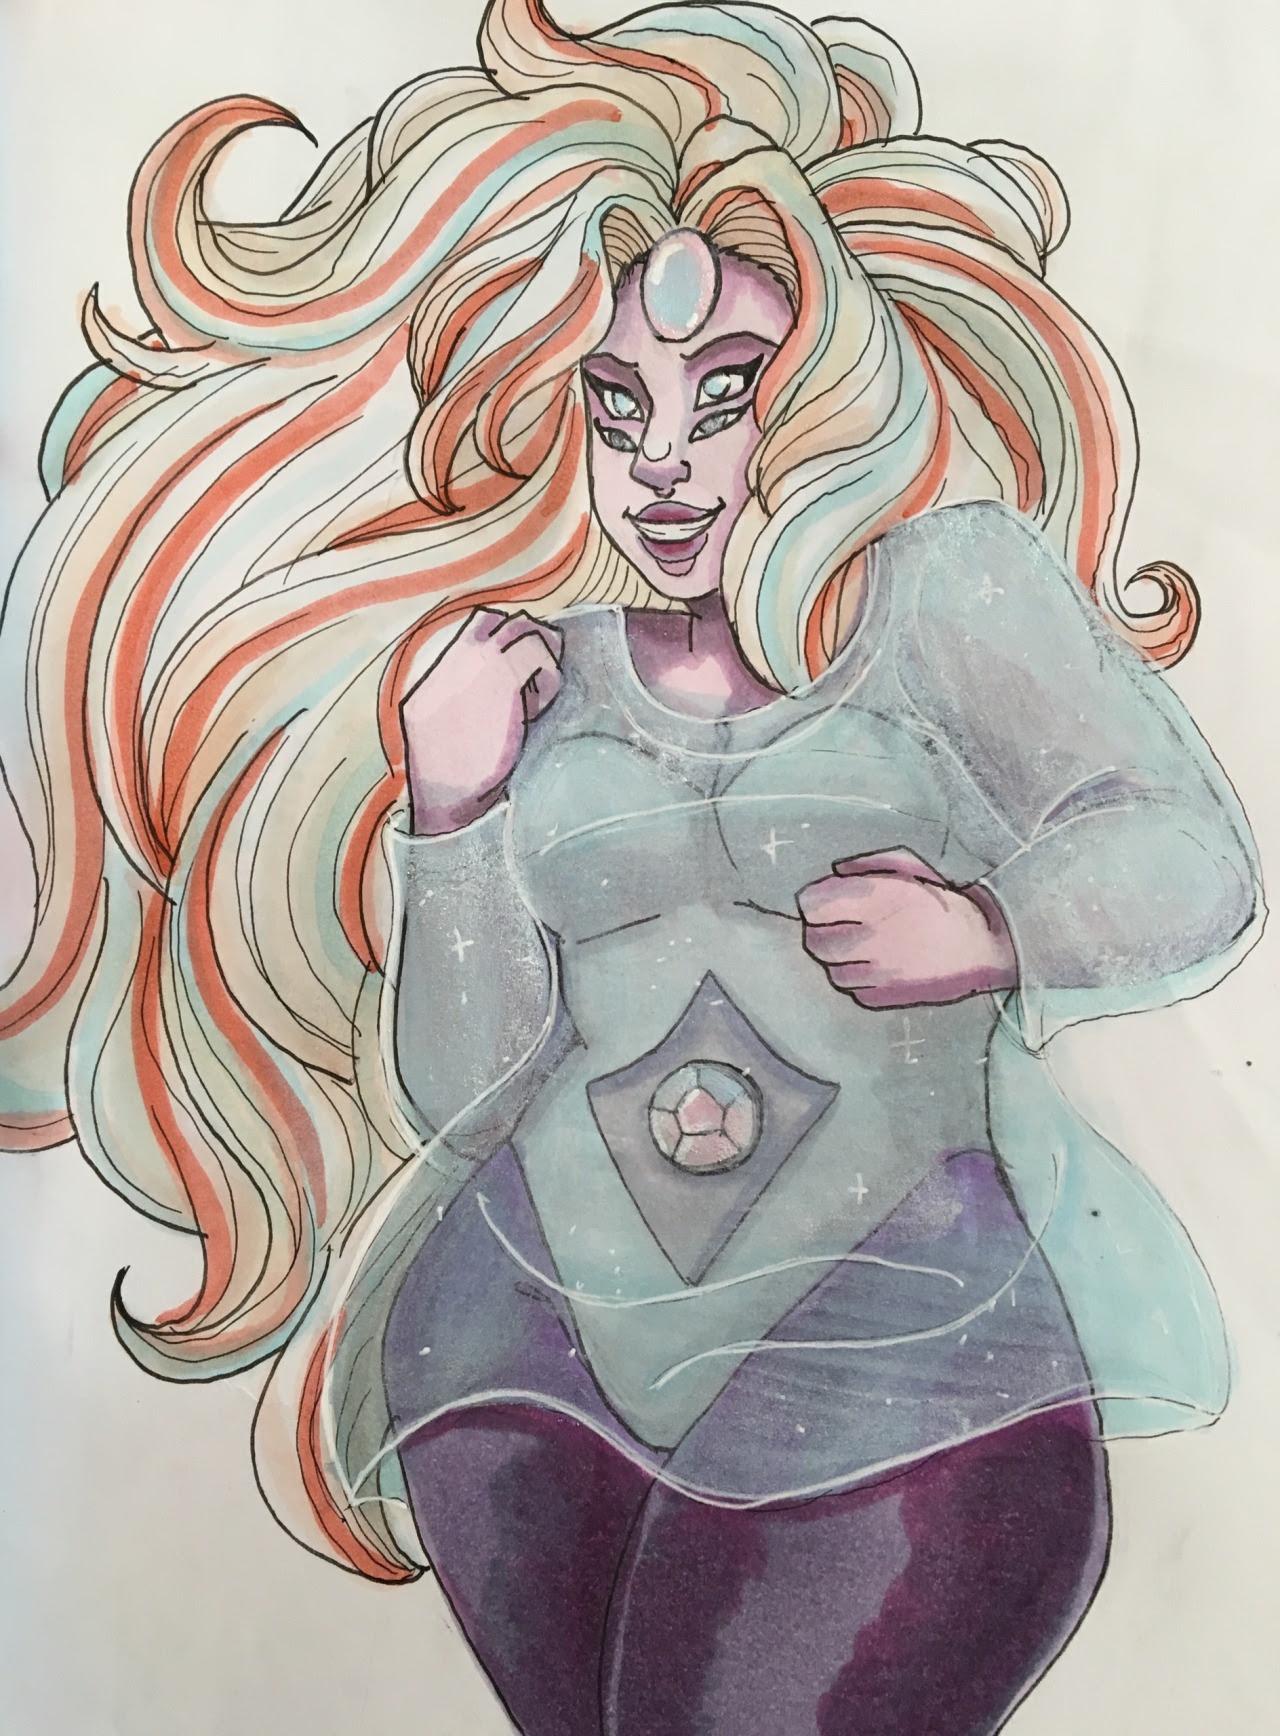 a gay quartz from my sketchbook